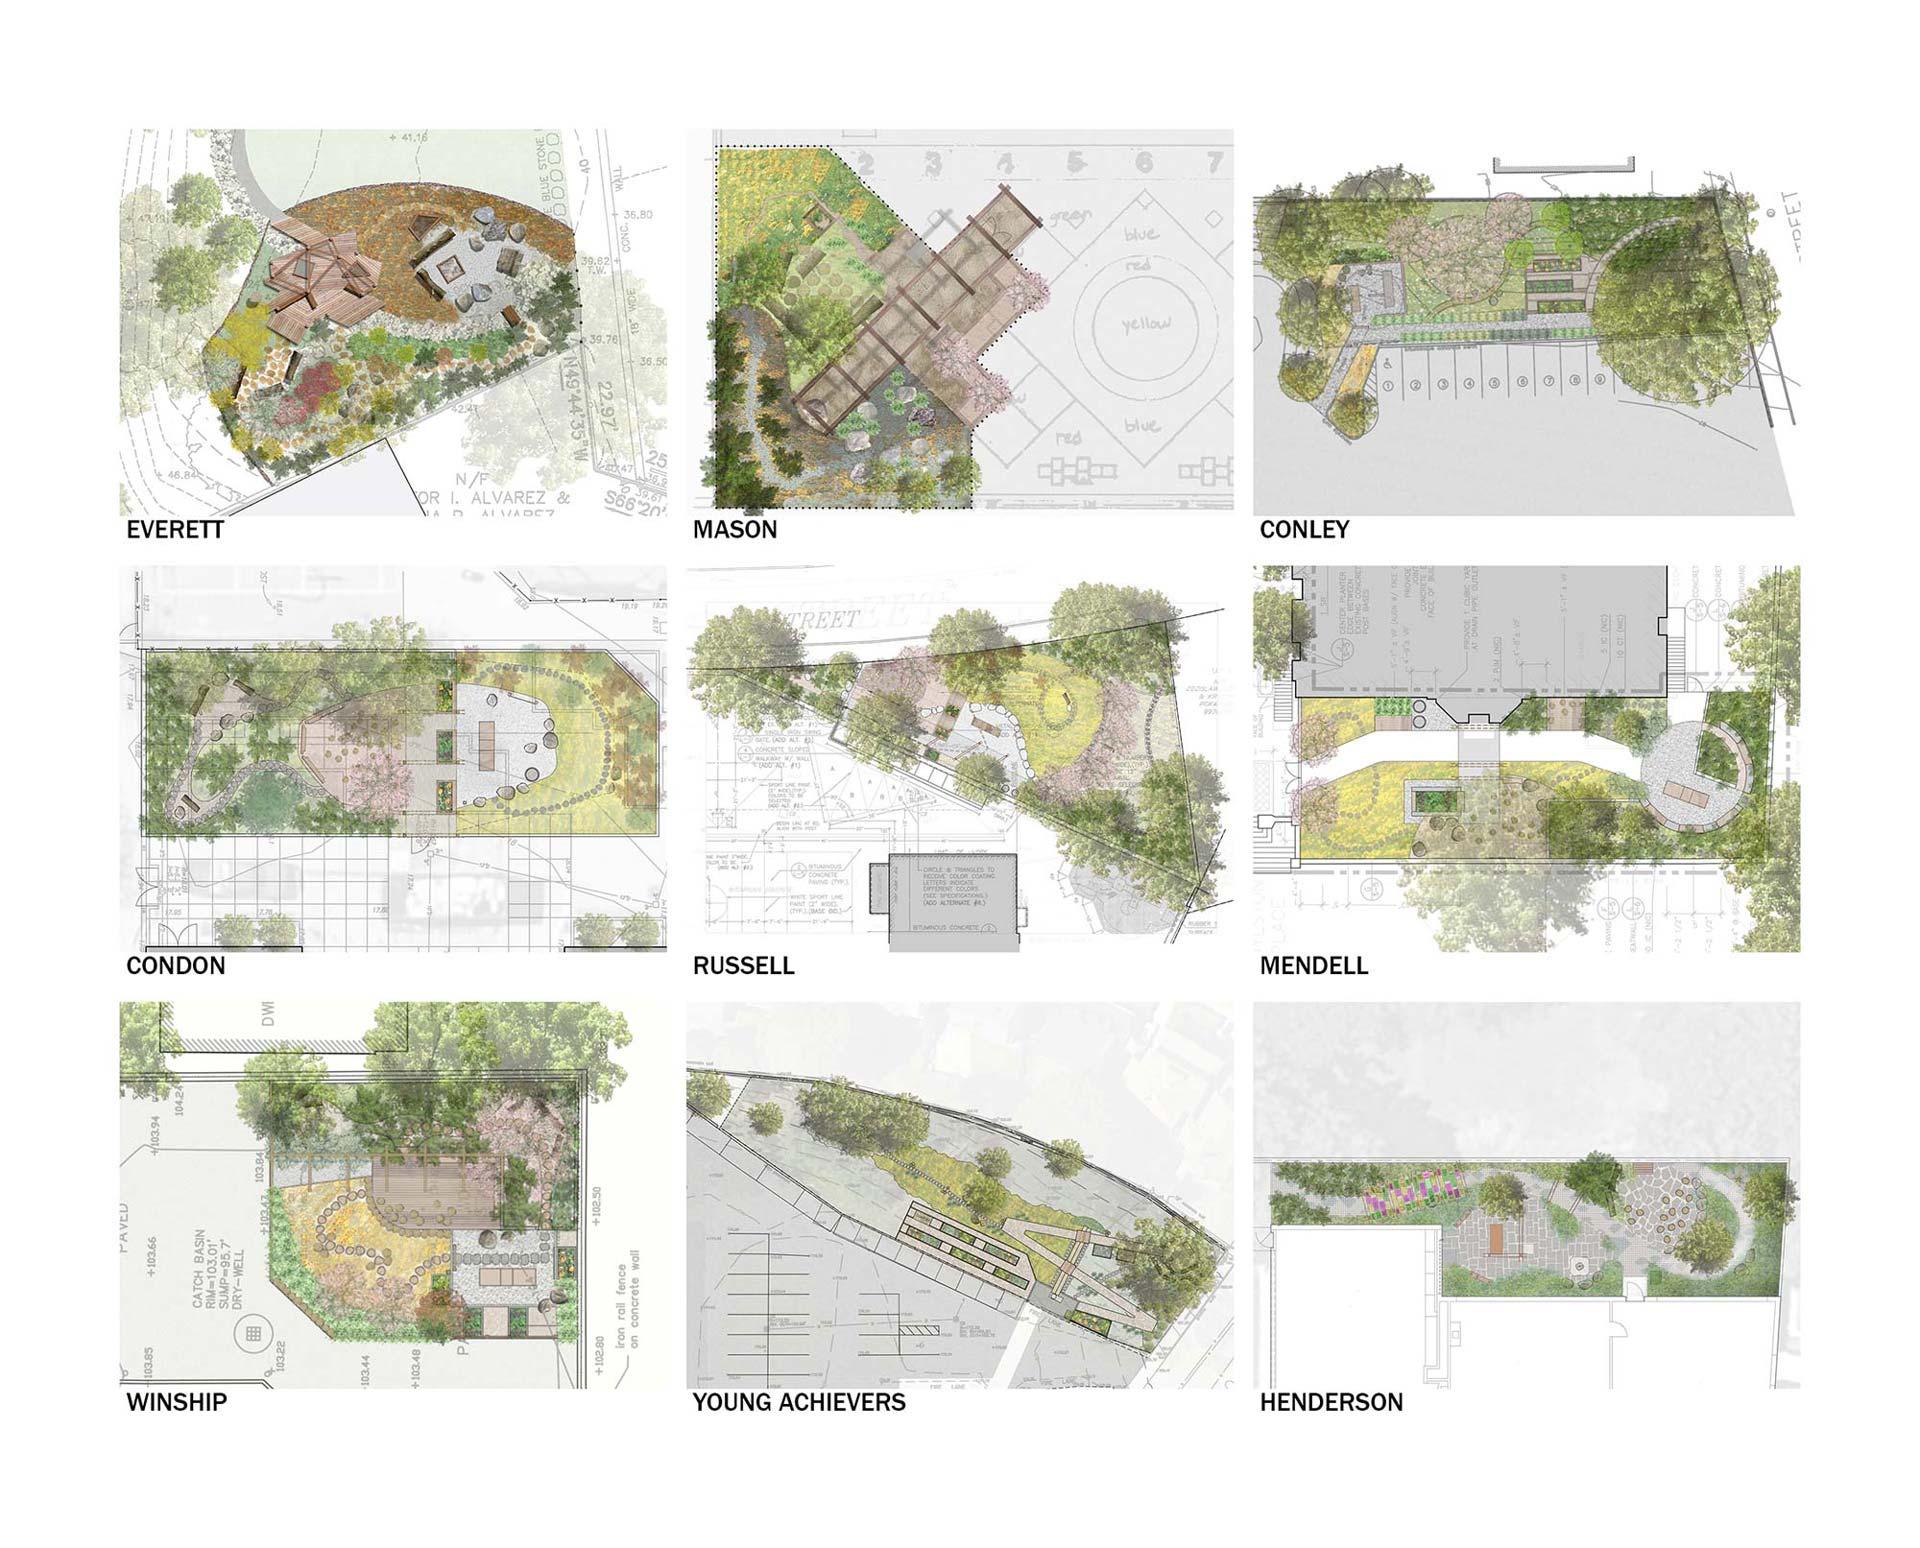 8_Schoolyard-Initiative_Klopfer-Martin-Design-Group_plans_outdoor-classroom.jpg